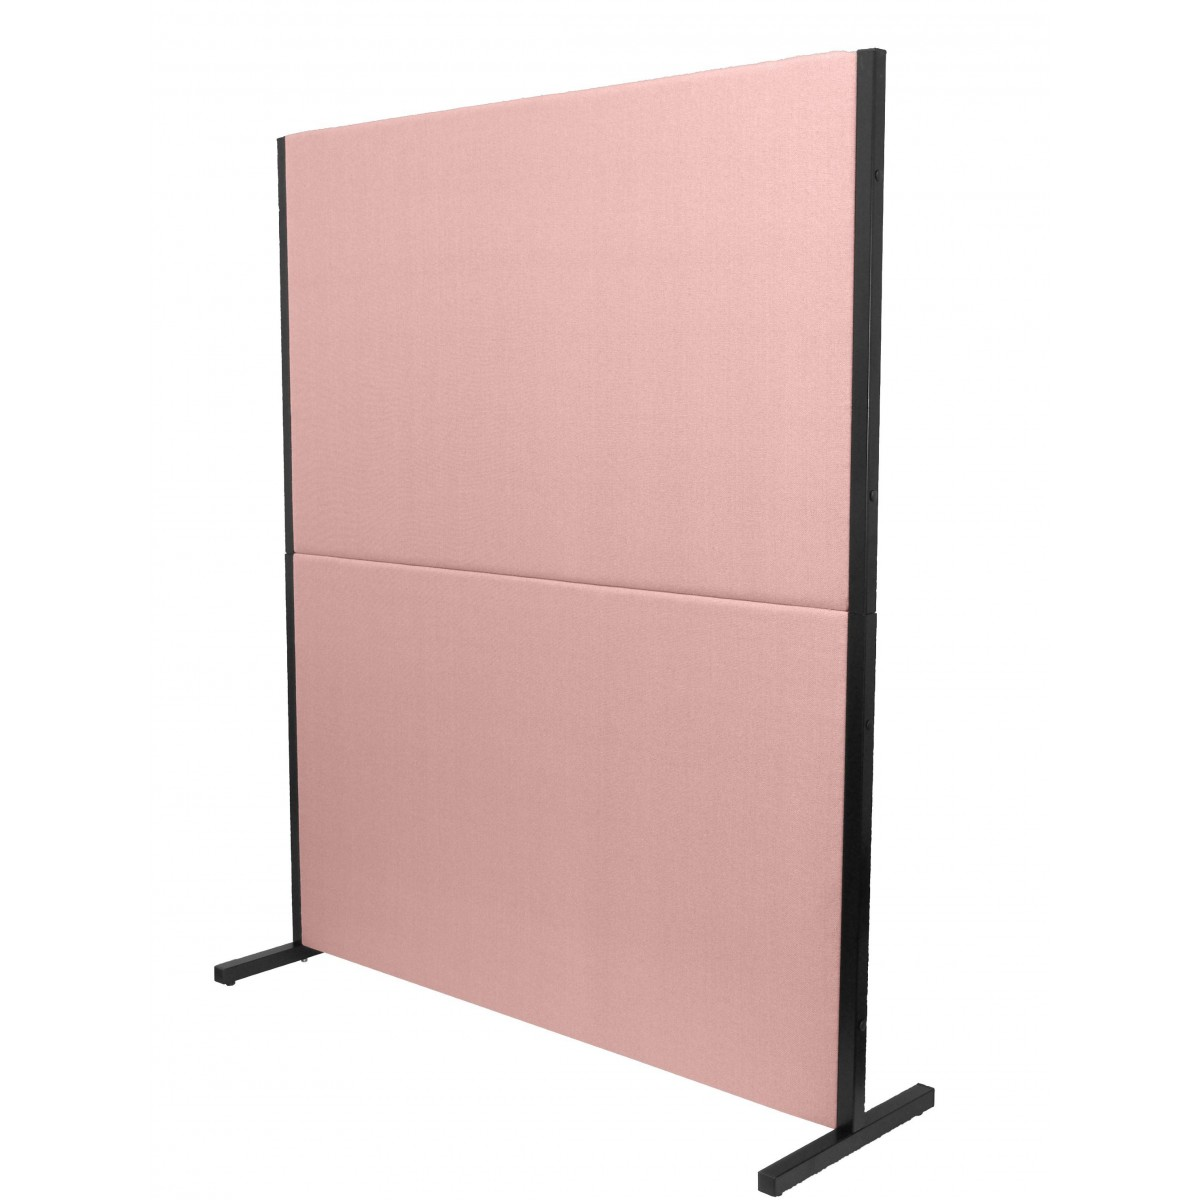 biombo acustico textil rosa